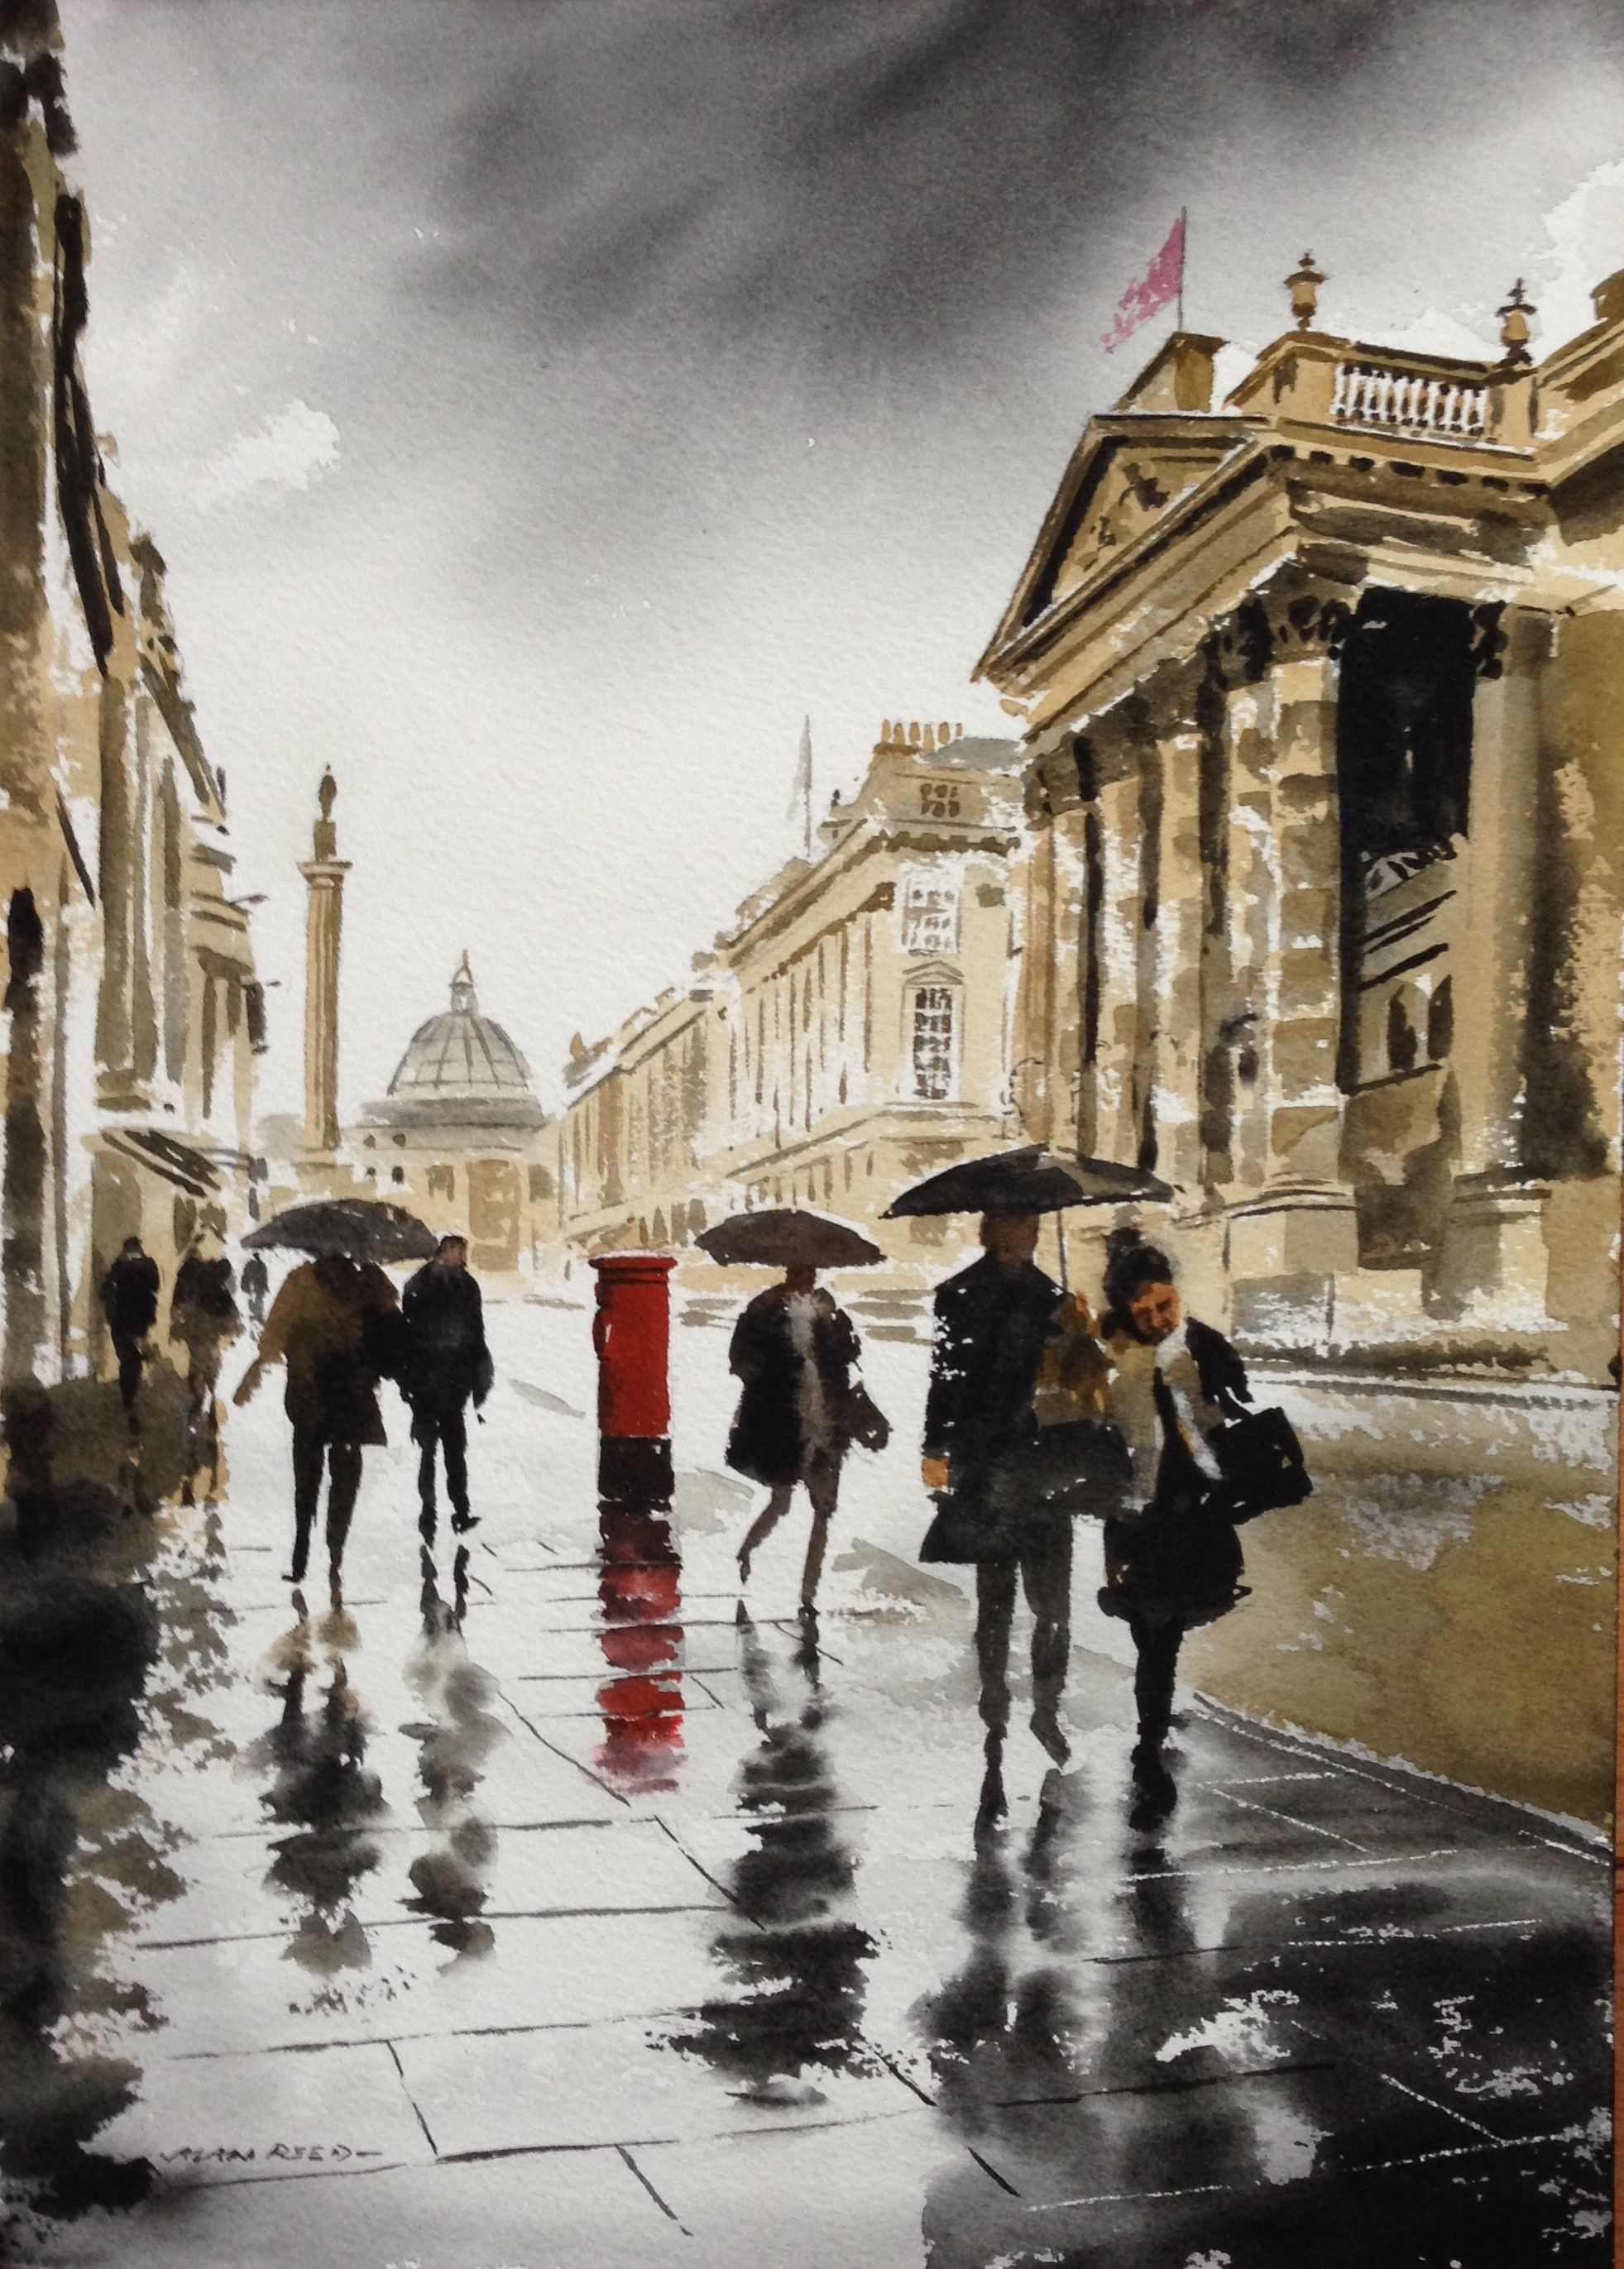 Original Watercolour Paintings Of Newcastle Upon Tyne In